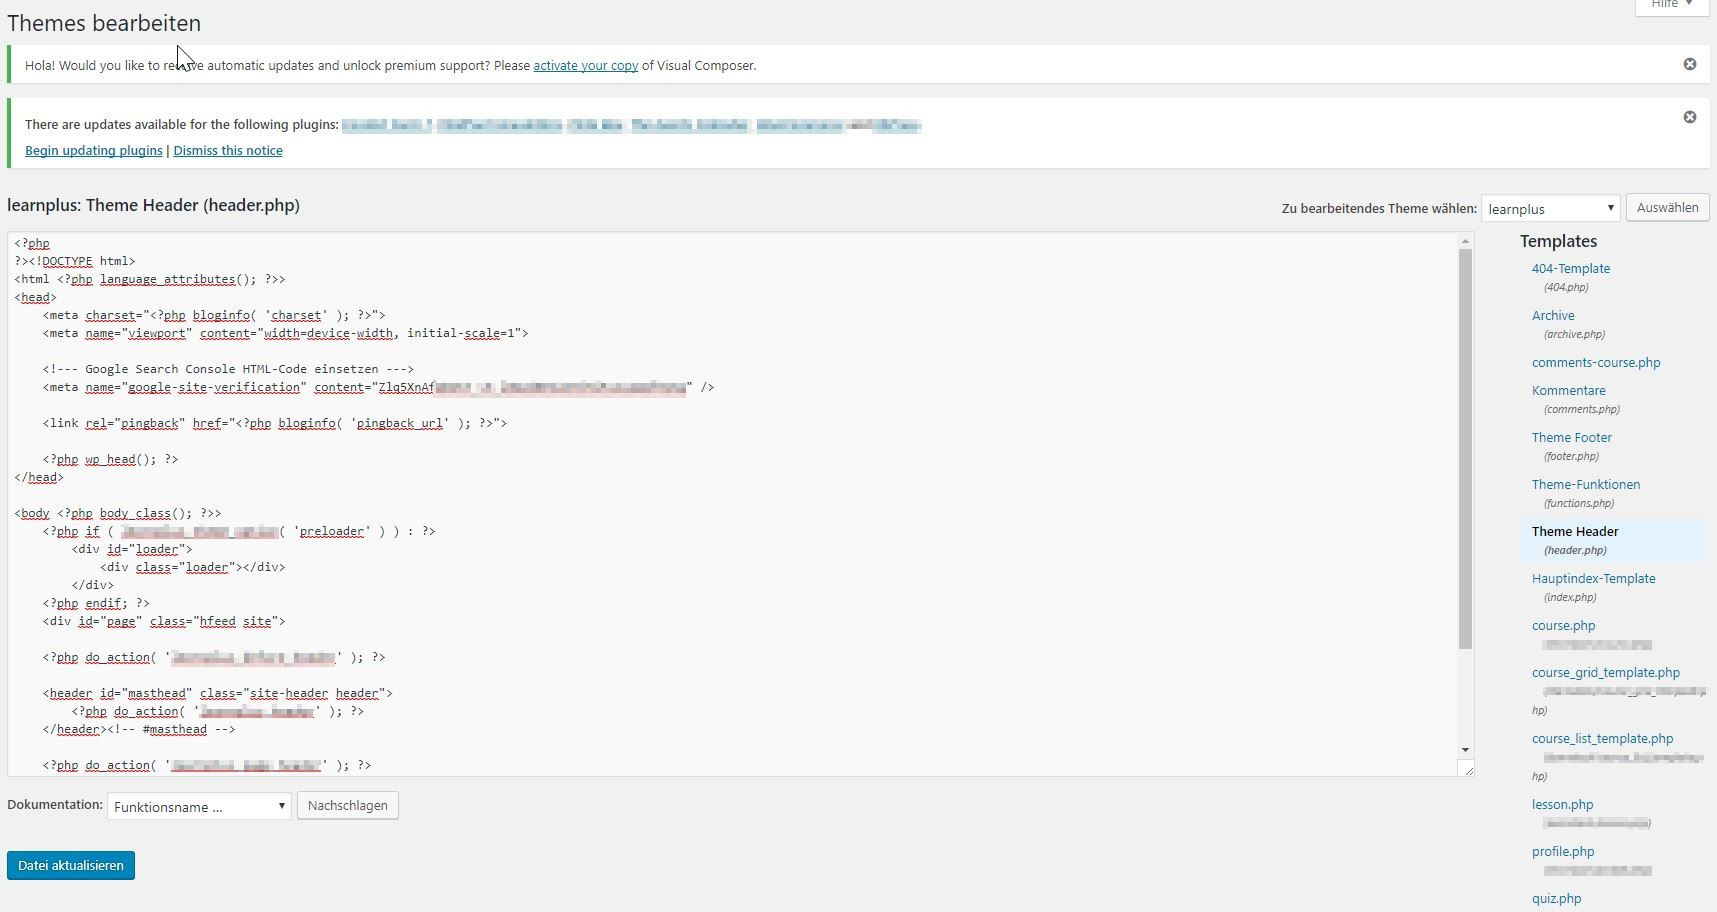 HTML-Tag im HTML-Code hinterlegen